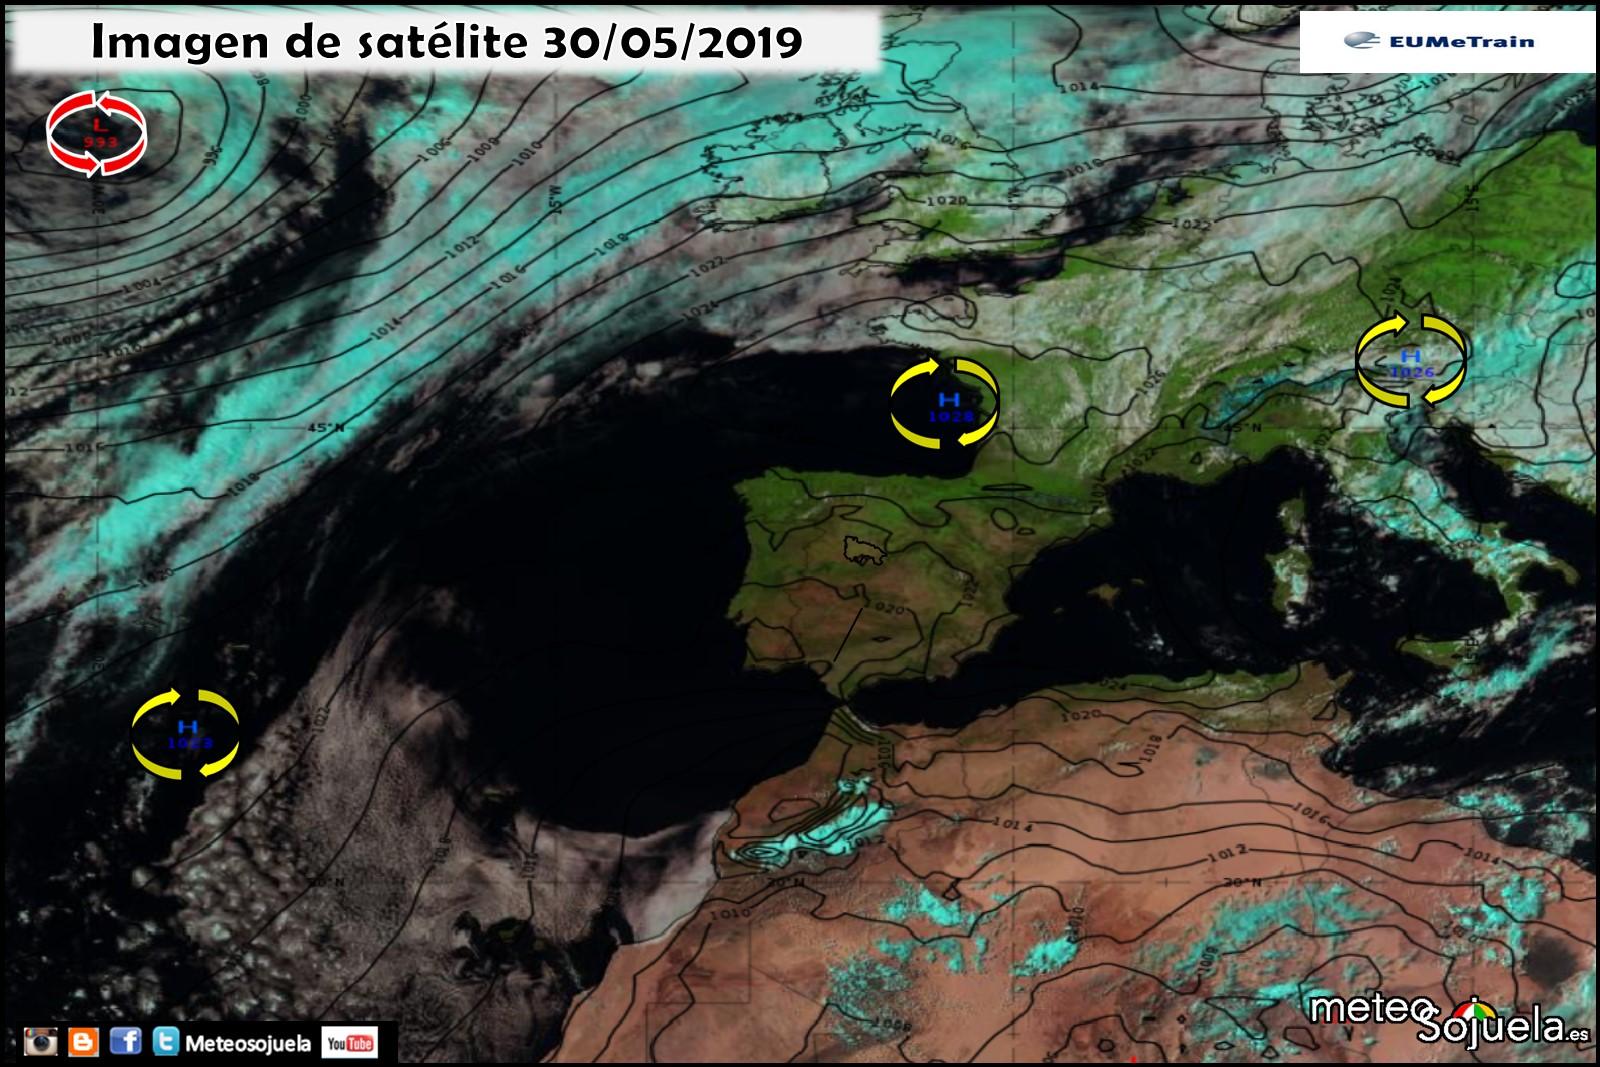 Imagen satélite Anticiclón. Meteosojuela